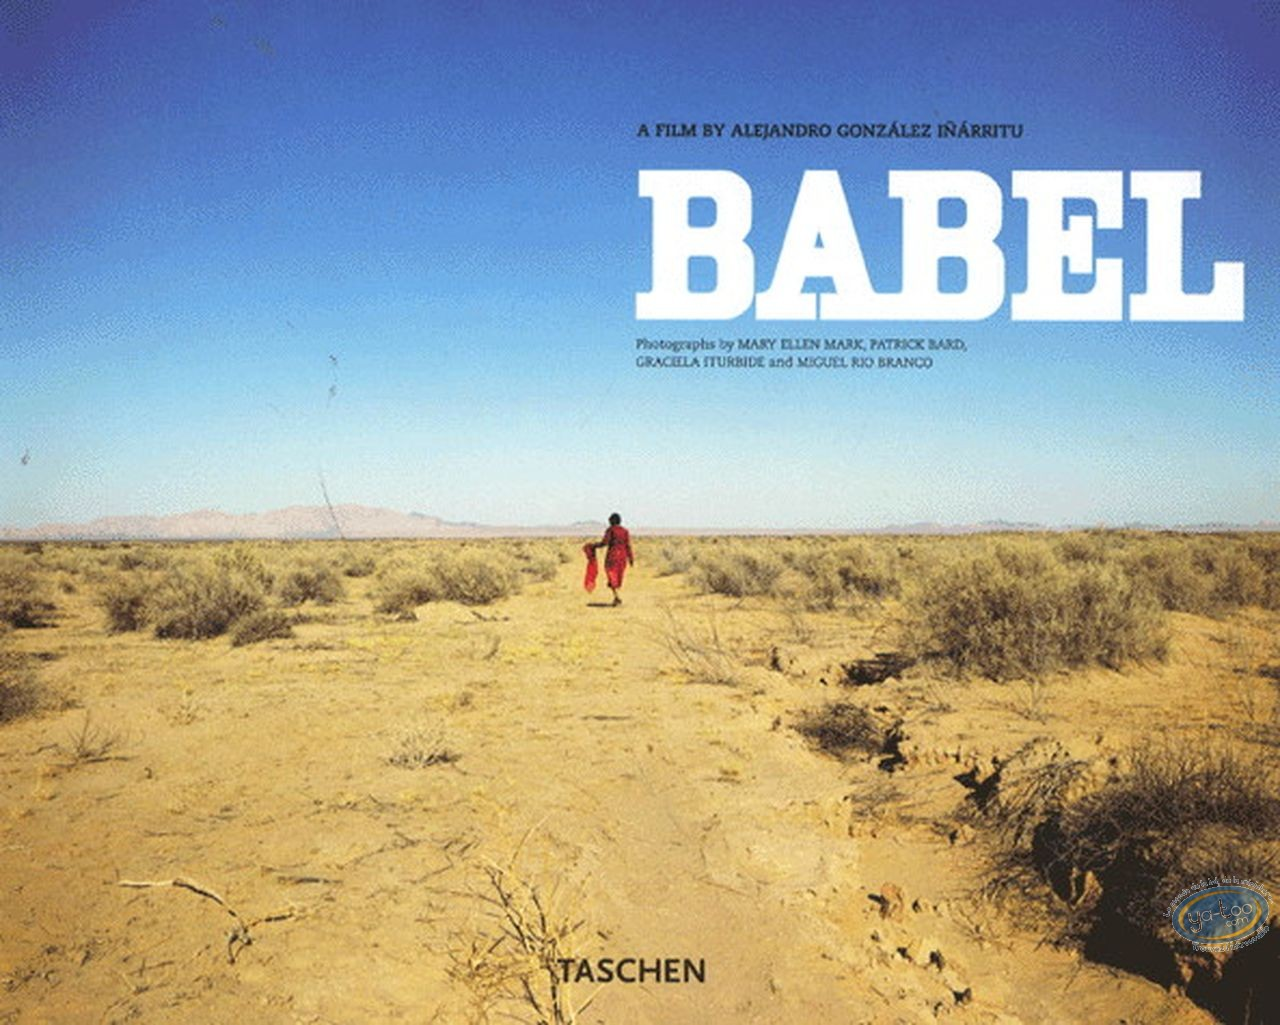 Livre, Babel - A film by Alejandro Gonzalez Inarritu